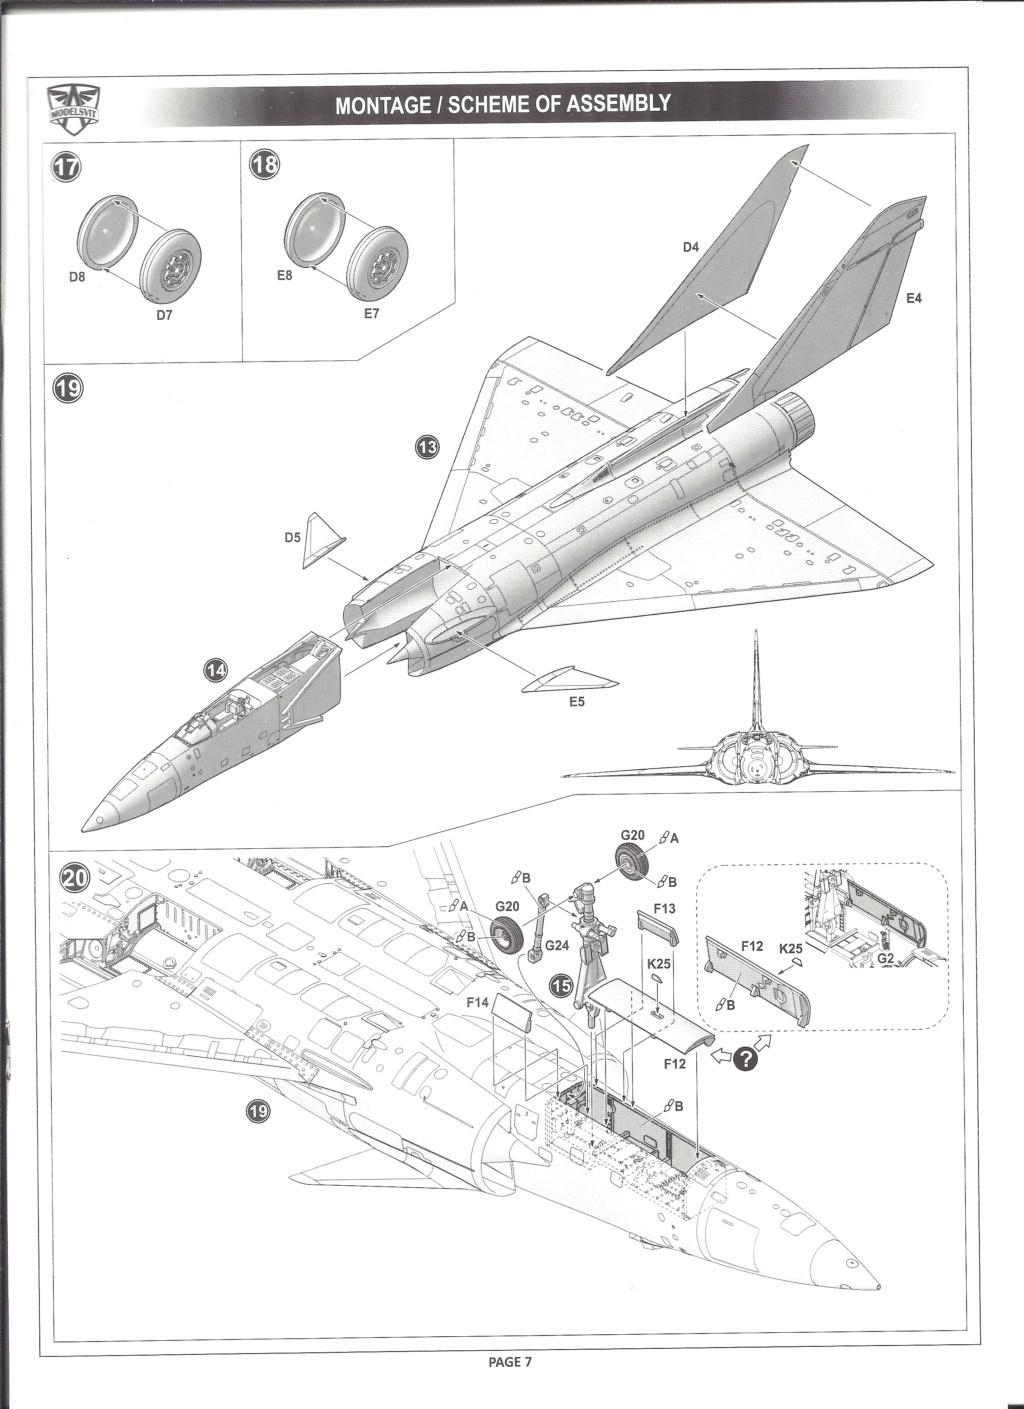 [MODELSVIT] DASSAULT MIRAGE 4000 1/72ème Réf 72052 Notice Models17